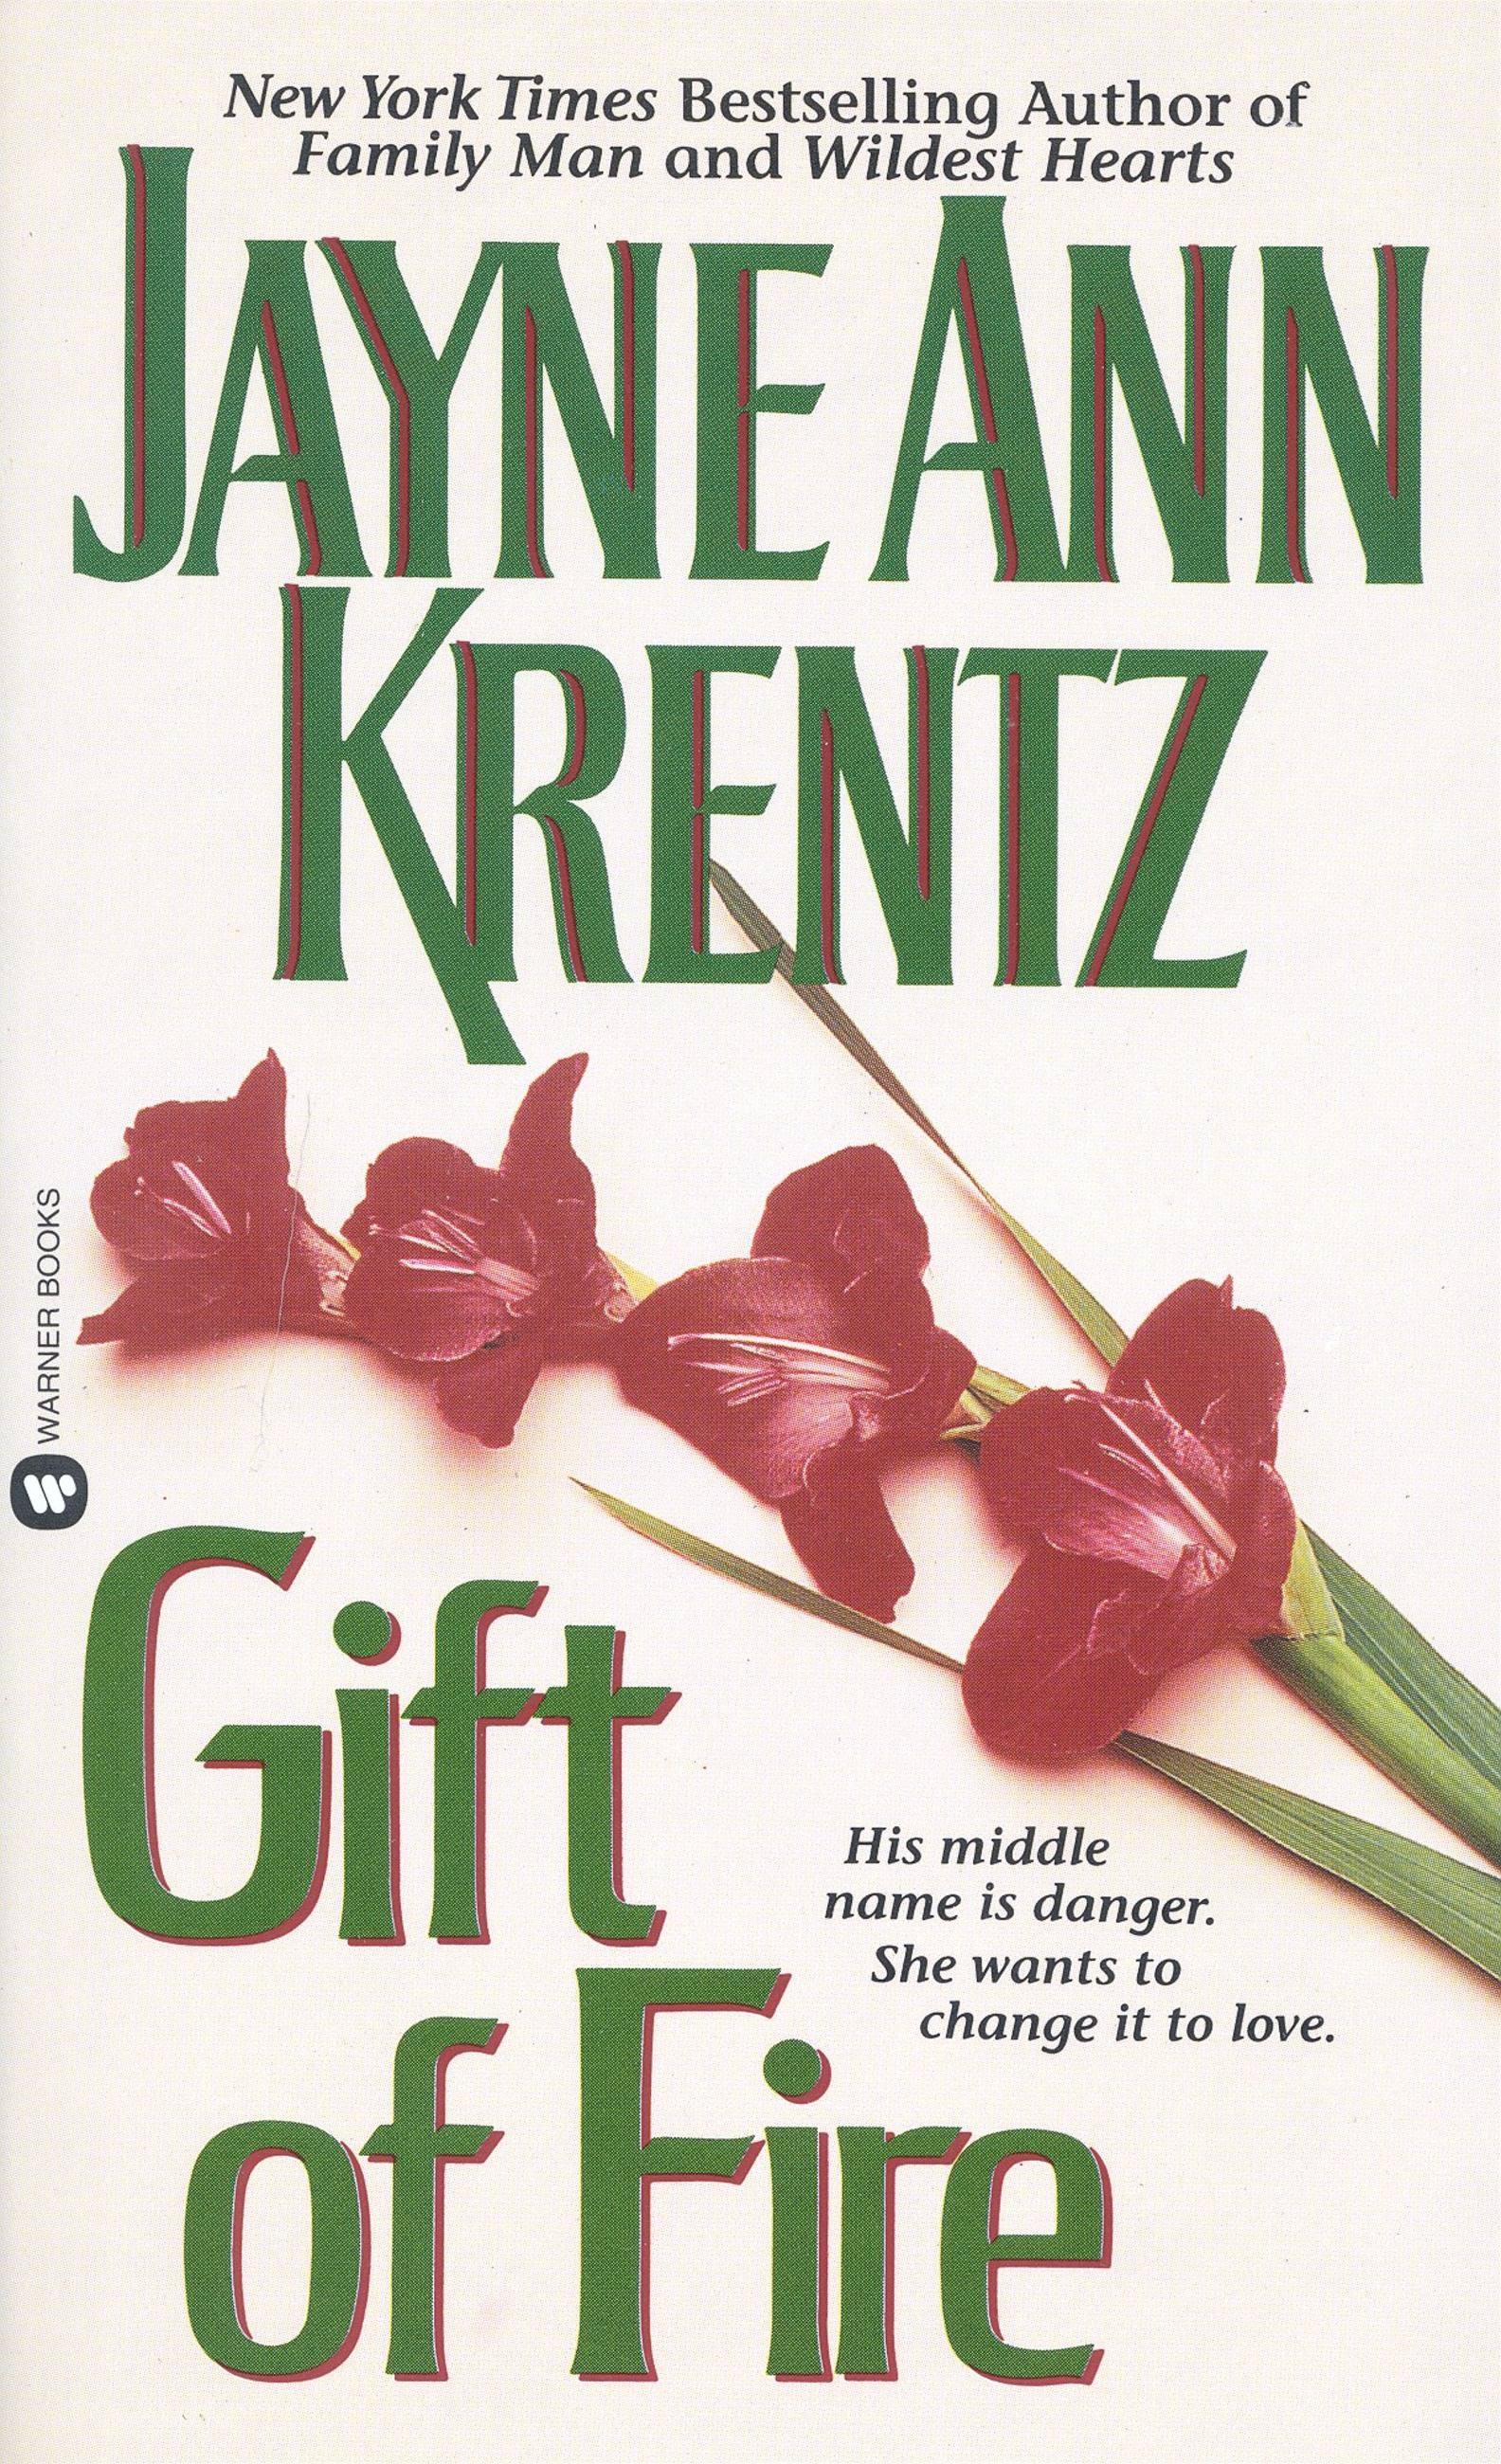 Gift of Fire (könyv) - Jayne Ann Krentz | Rukkola.hu